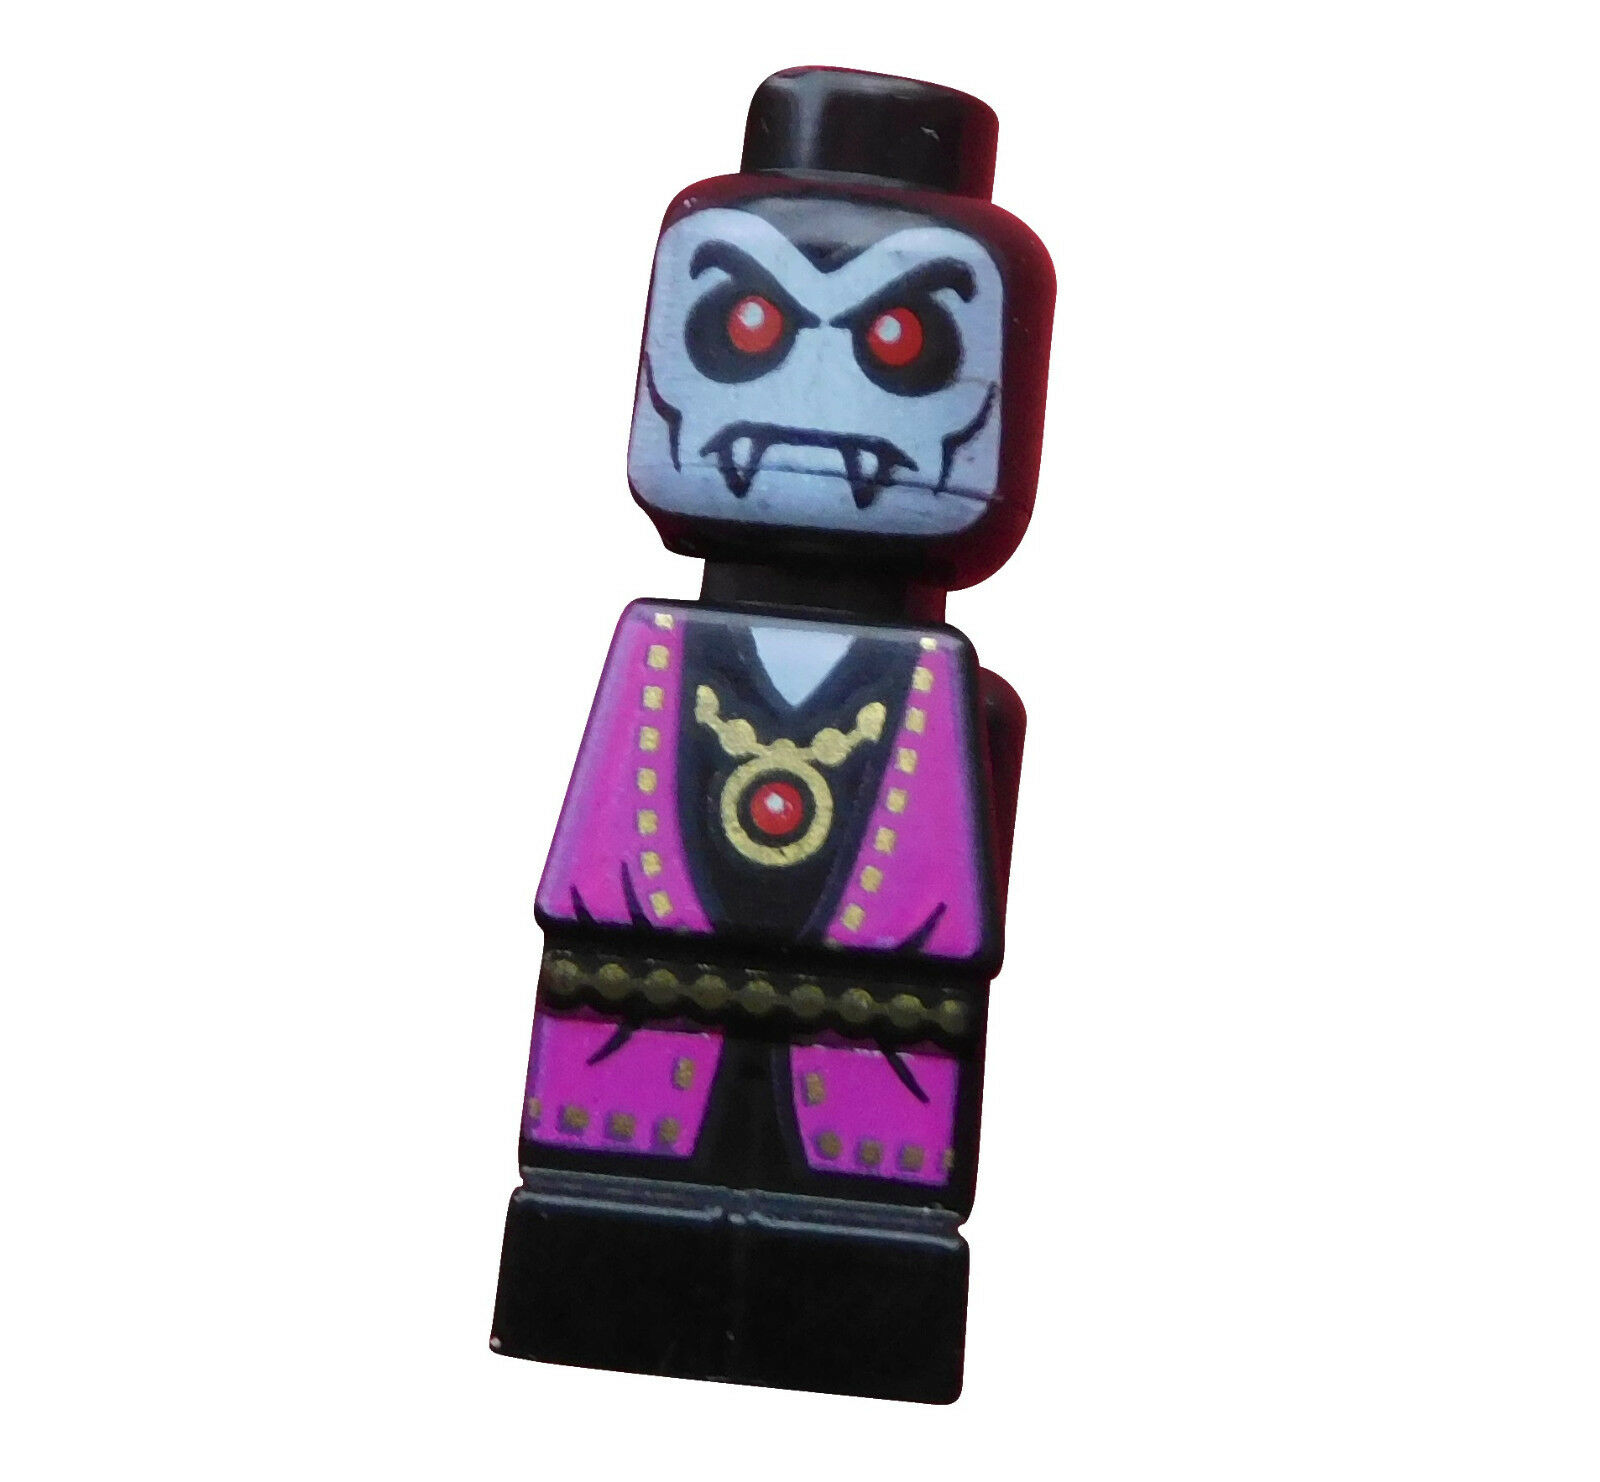 Lego Heroica 5 x Vampire Micro Figure New Vampire Lord Micofig New Microfigures